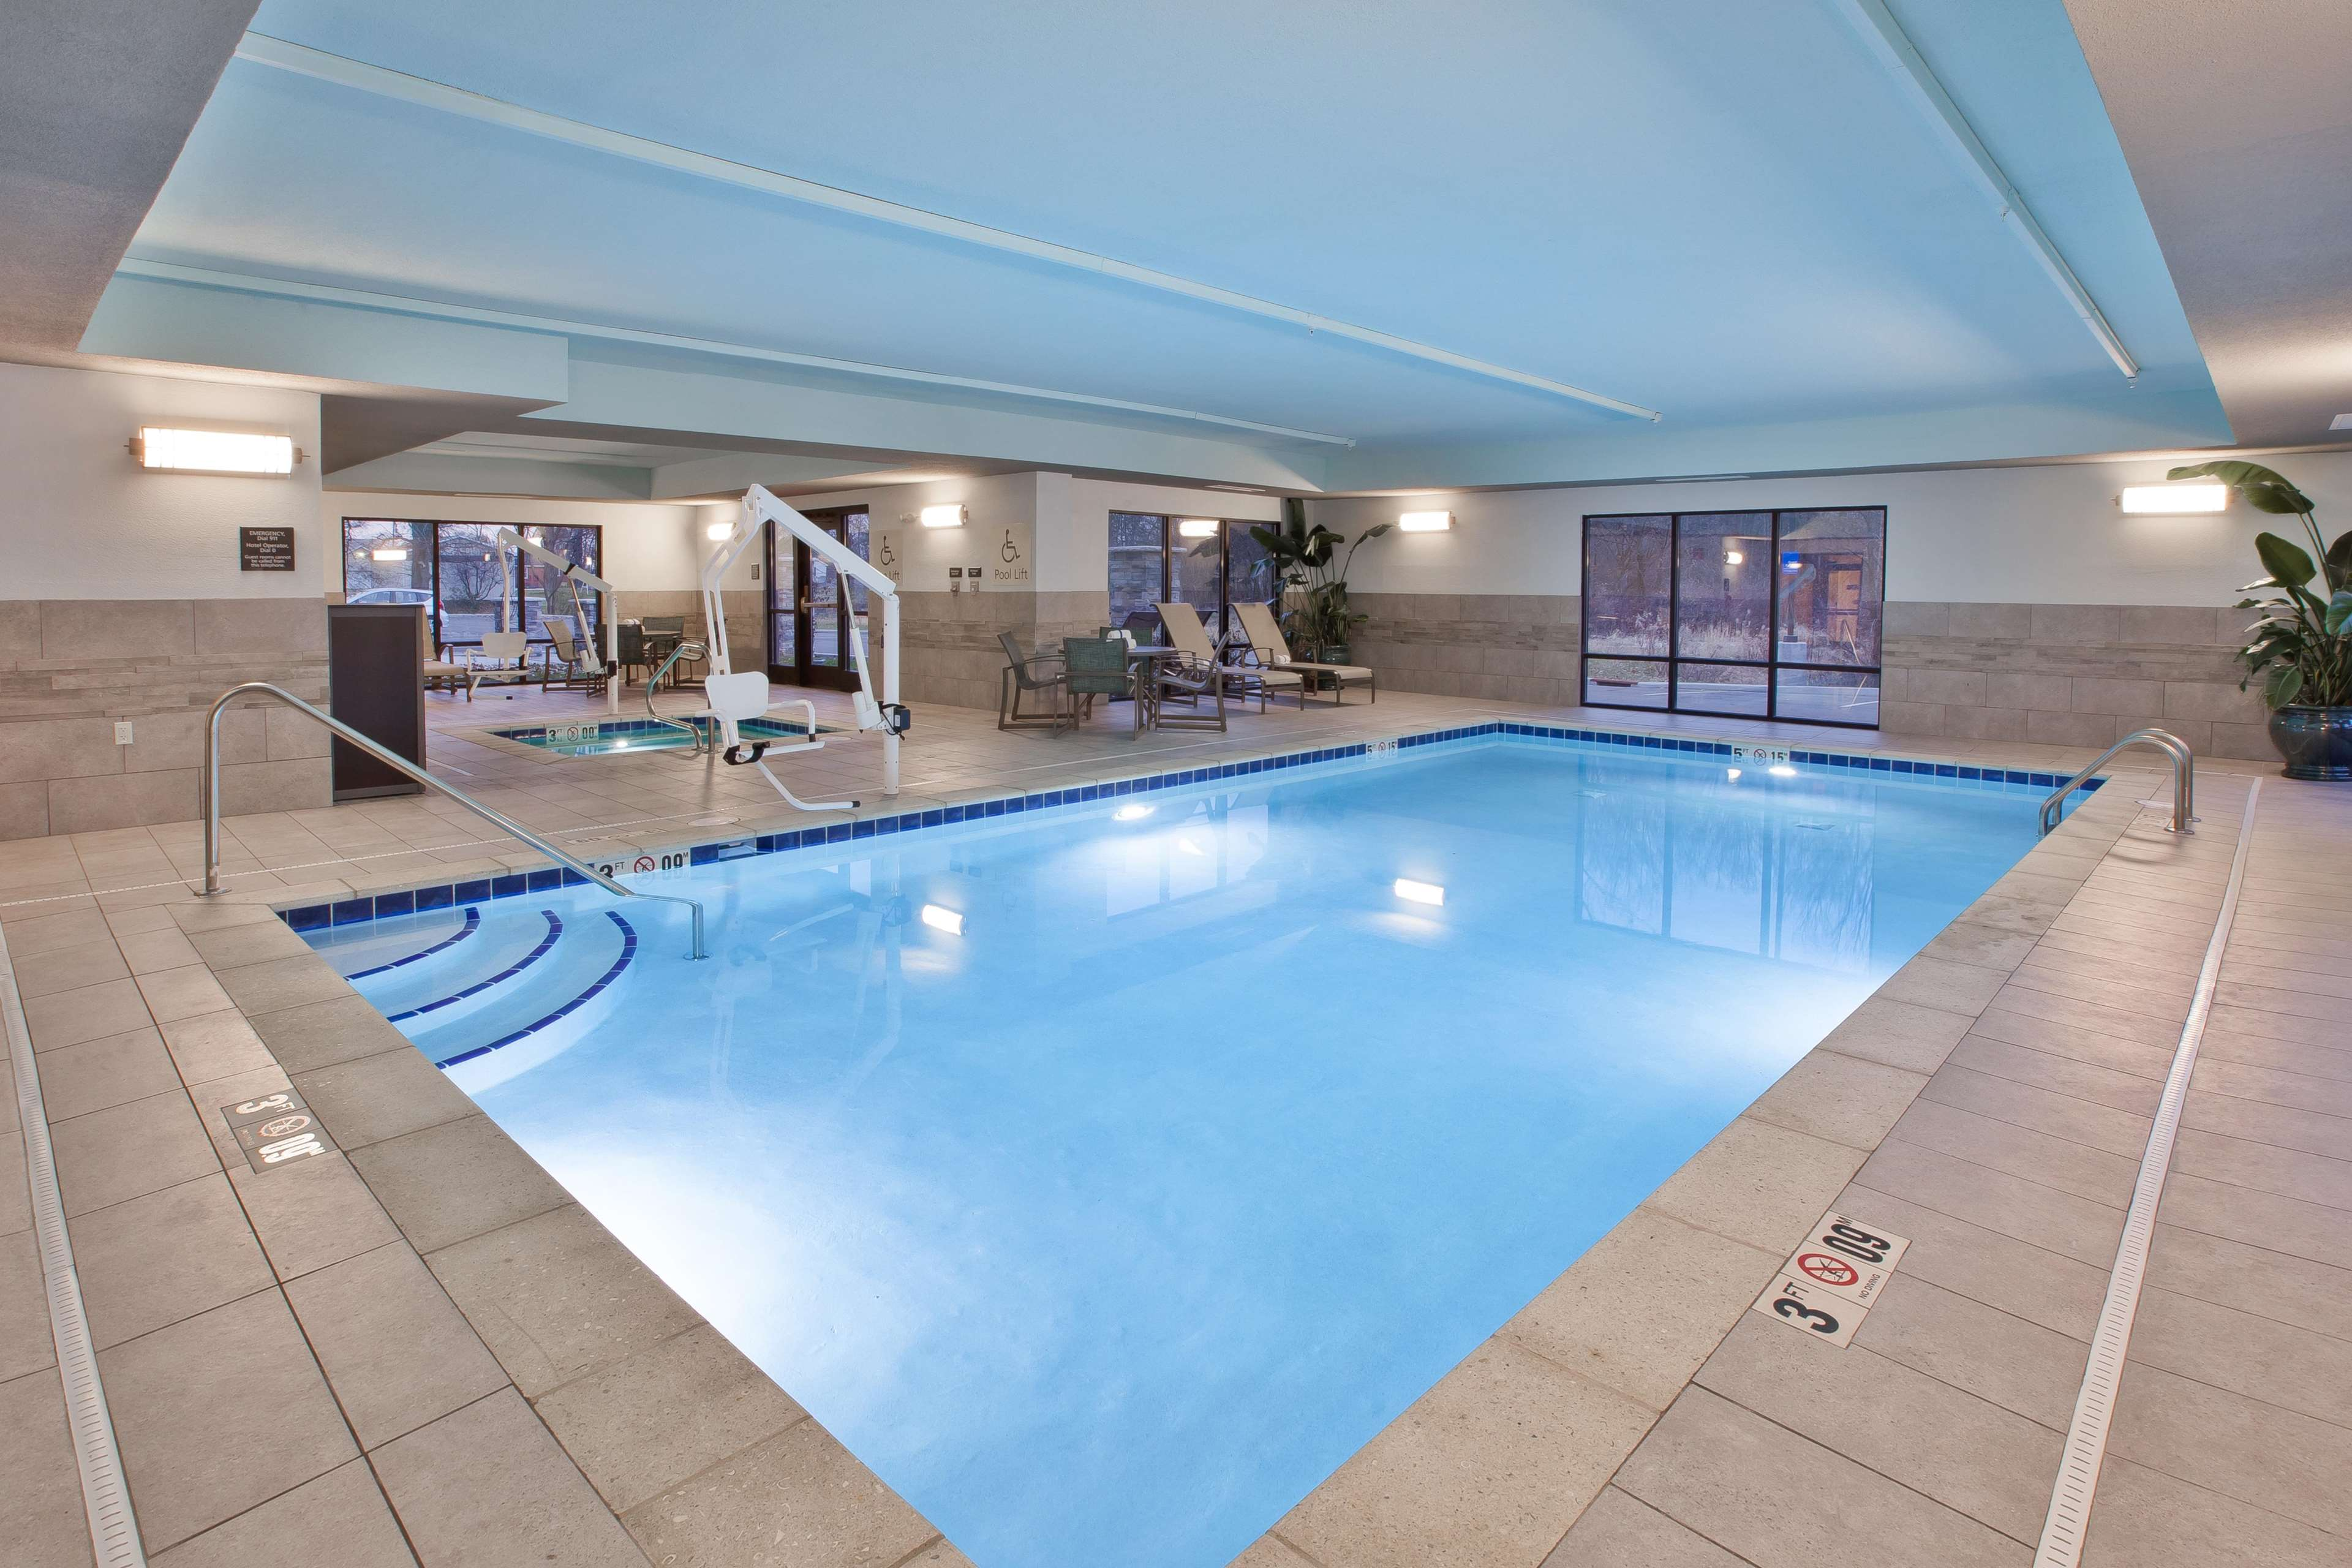 Hampton Inn & Suites Alliance image 5